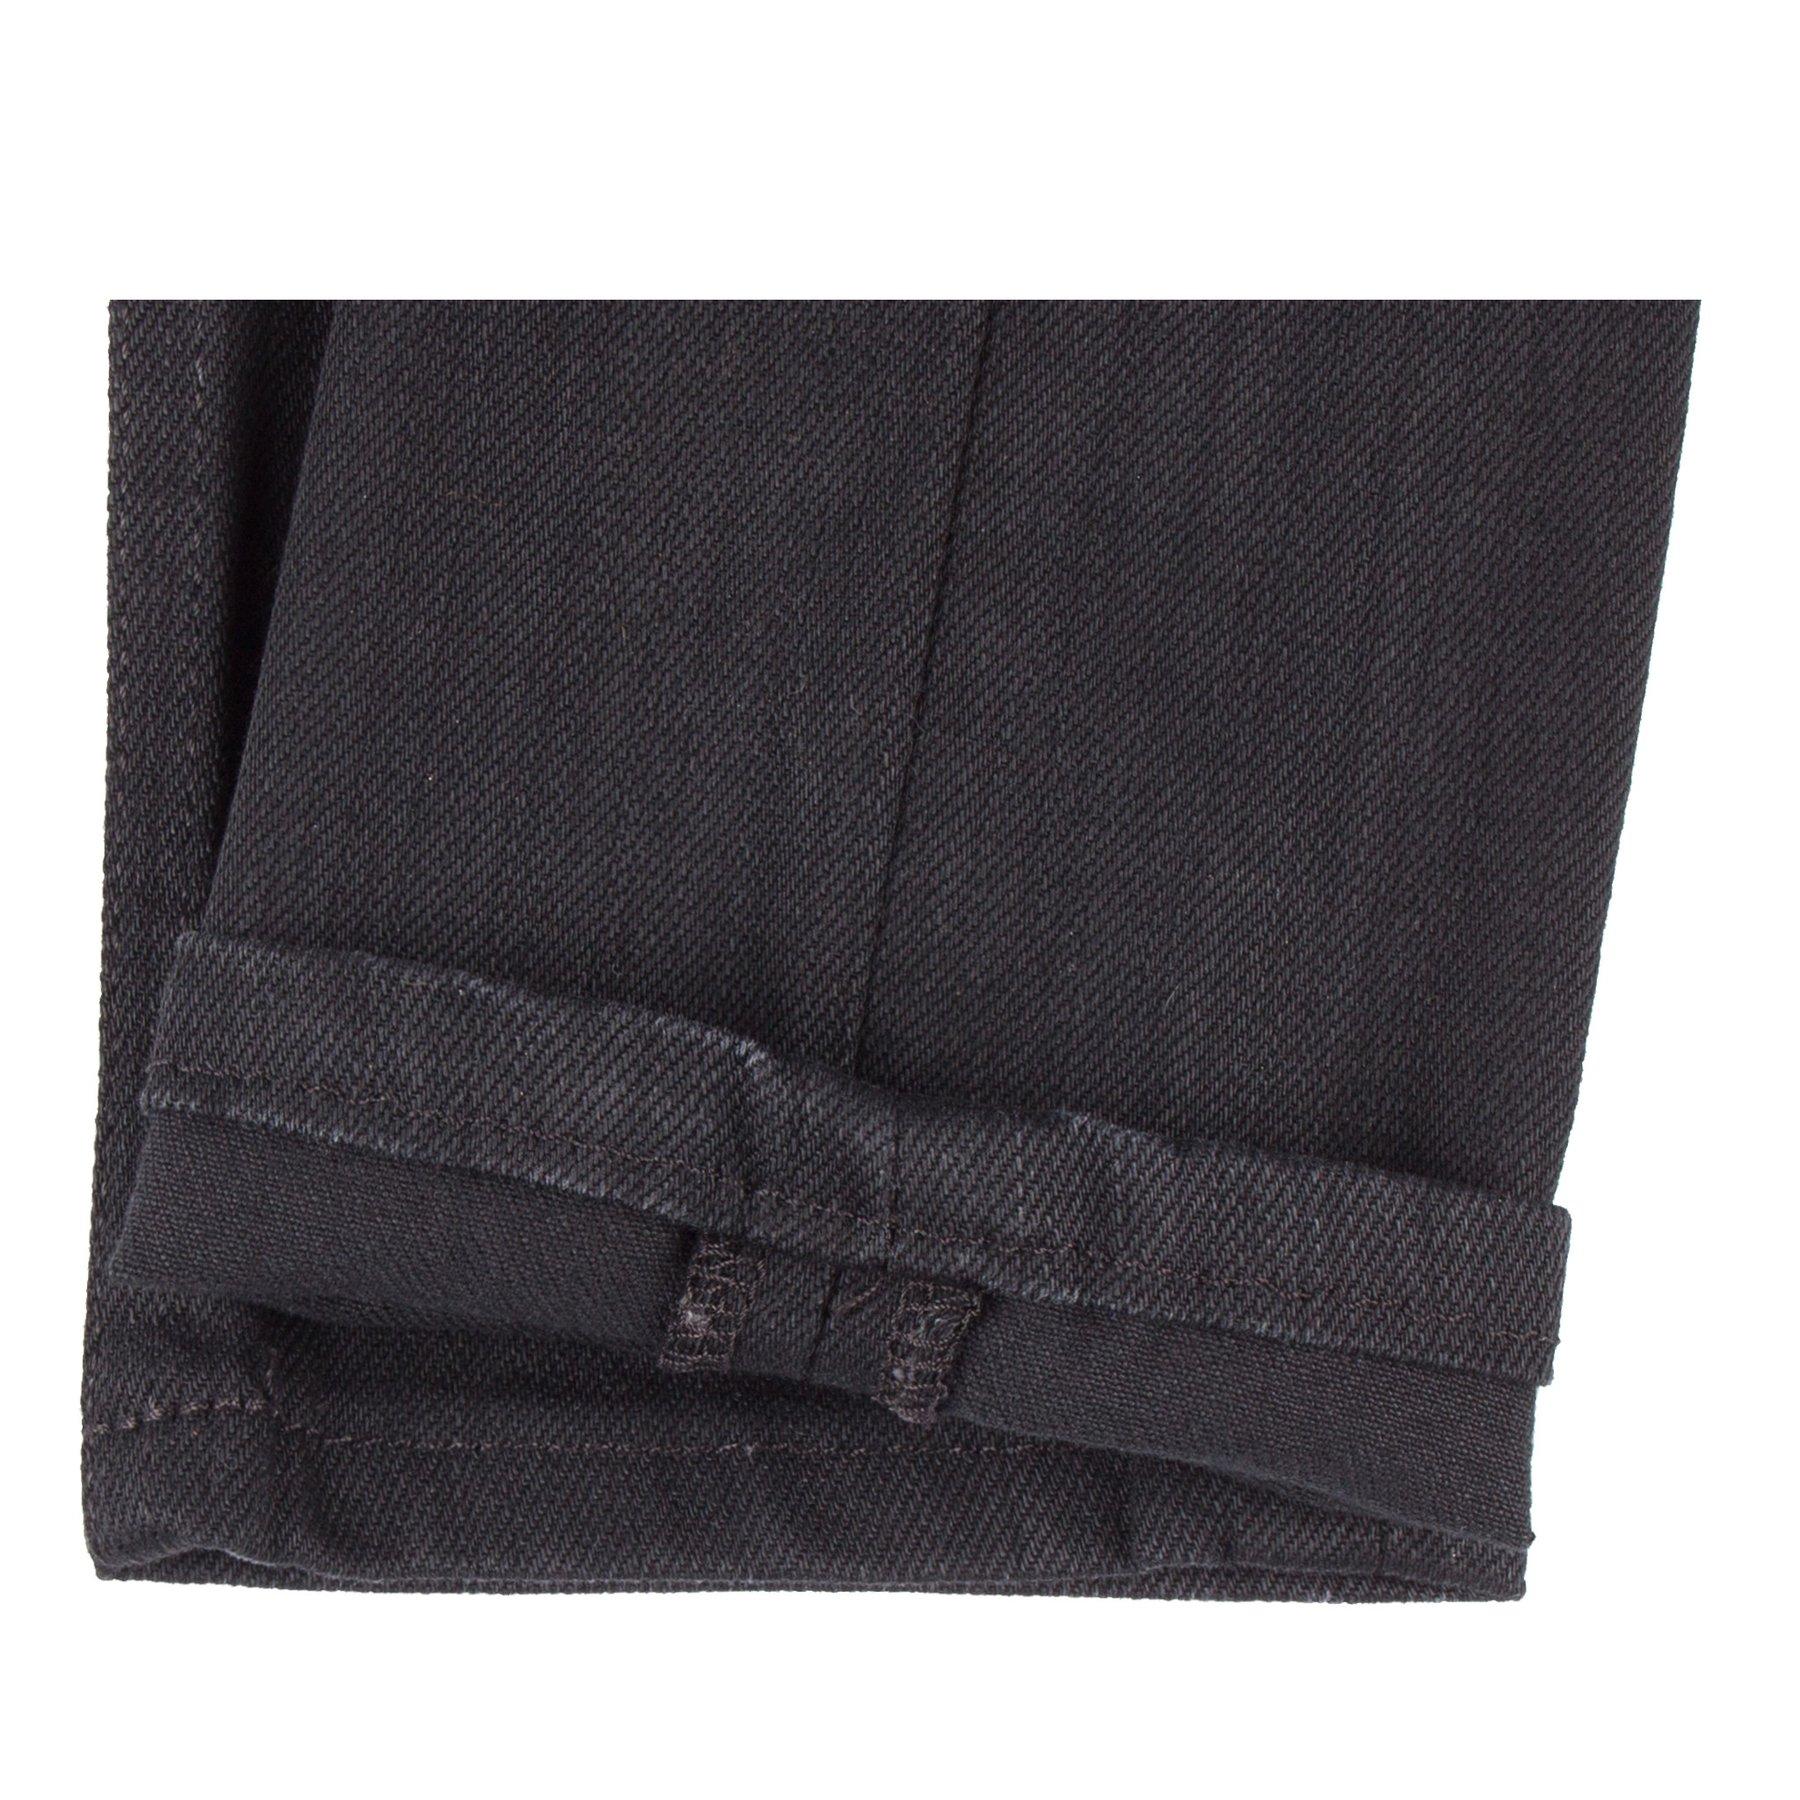 Women's Black Power-Stretch jeans Hem